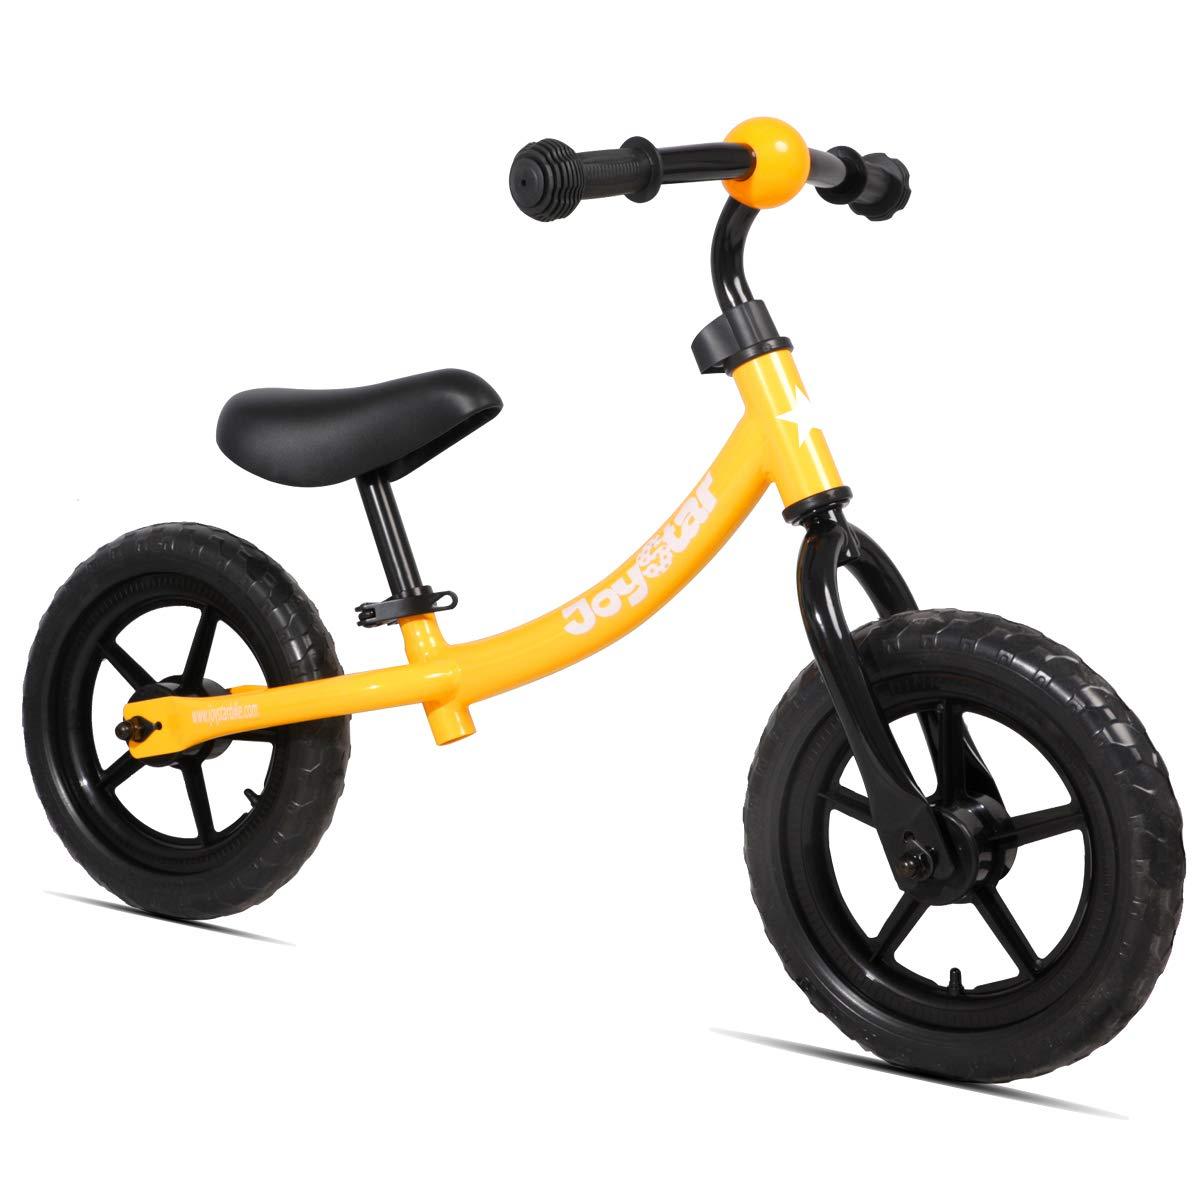 JOYSTAR Balance Bike for 1.5-5 Years Boys & Girls, Unisex Toddler Push Bicycle for Child, 12 inch Kids Glider Bike, Children Slider Cycle, Orange